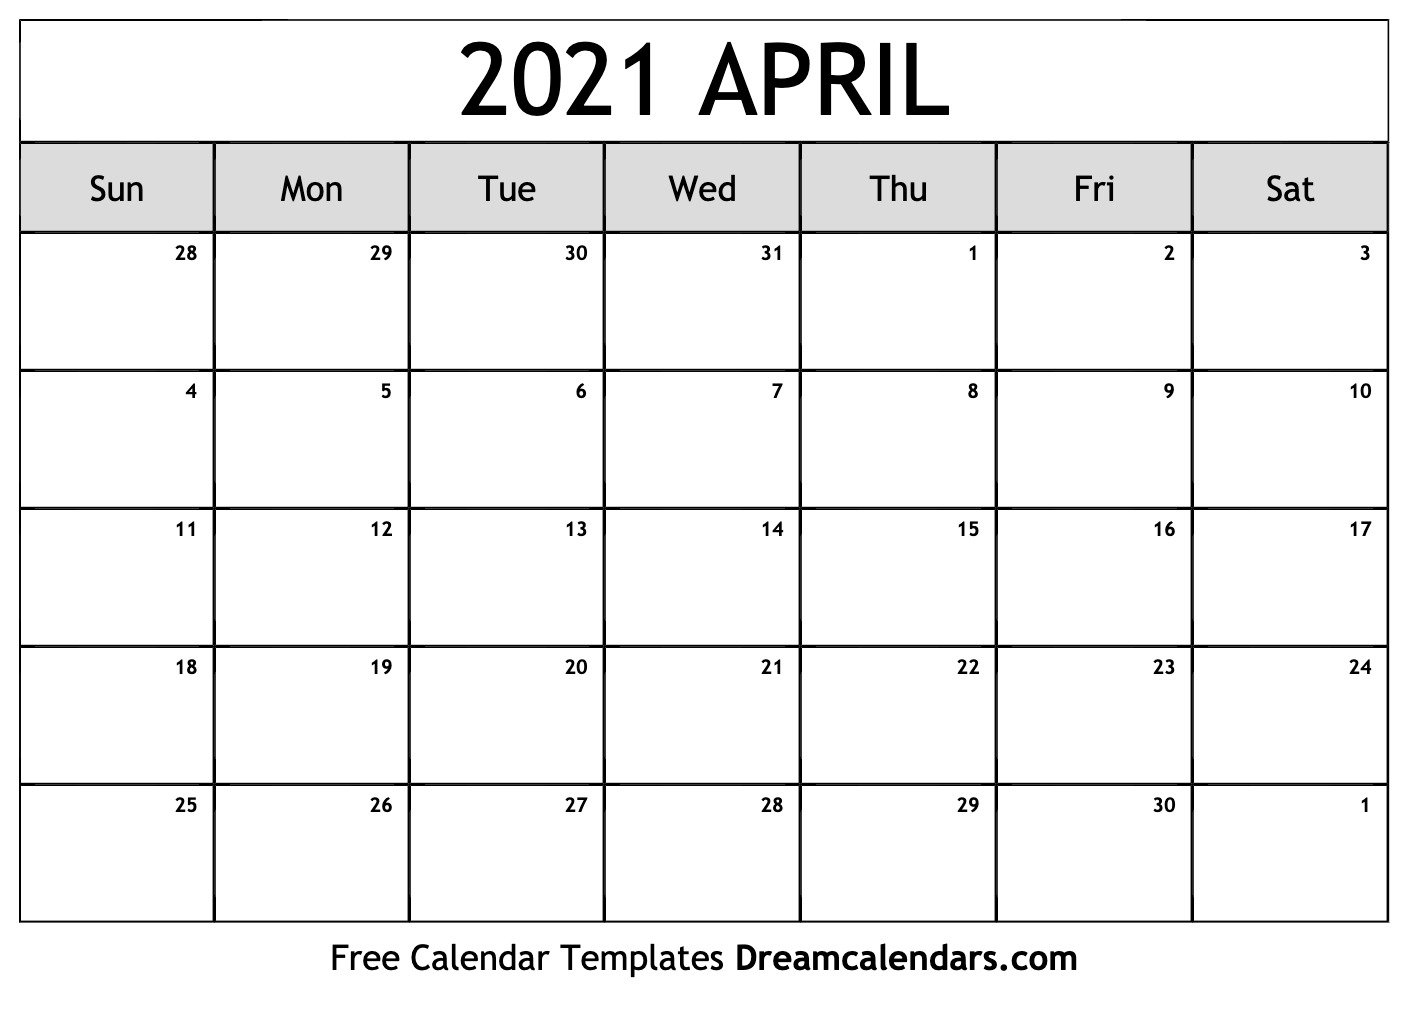 April 2021 Calendar   Free Blank Printable Templates 8X11 Sie Free April Calander